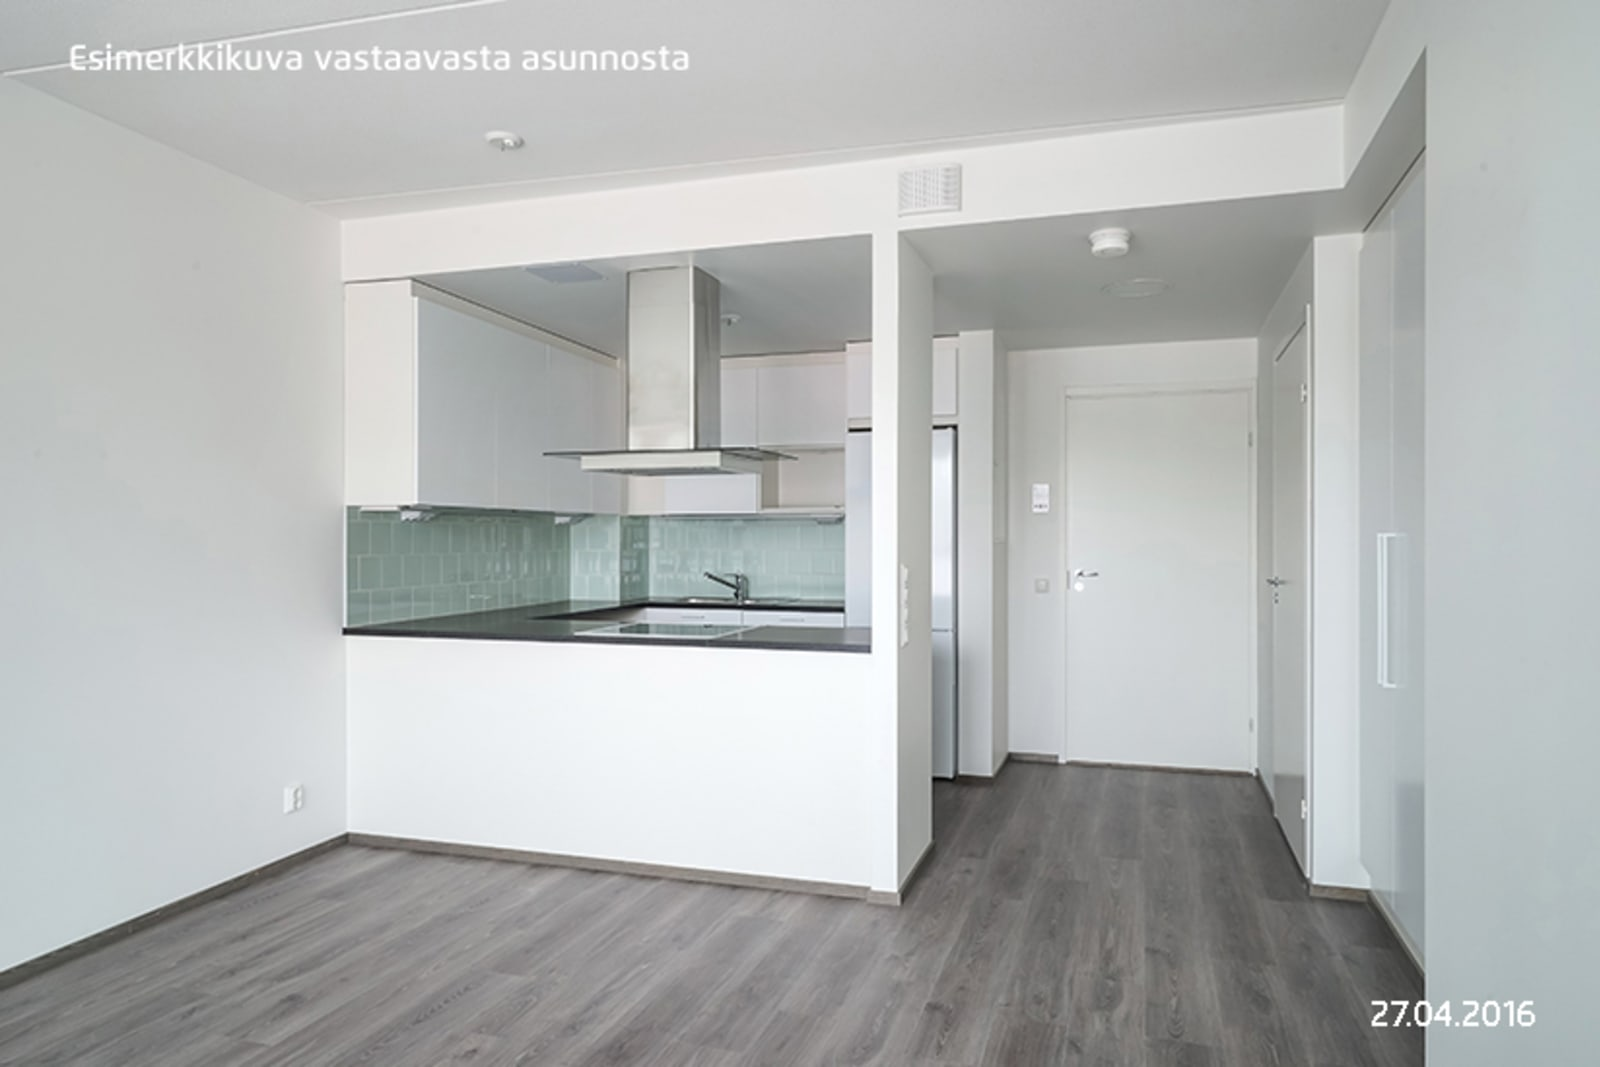 Vantaa, Keimolanmäki, Leksankuja 3 A 008